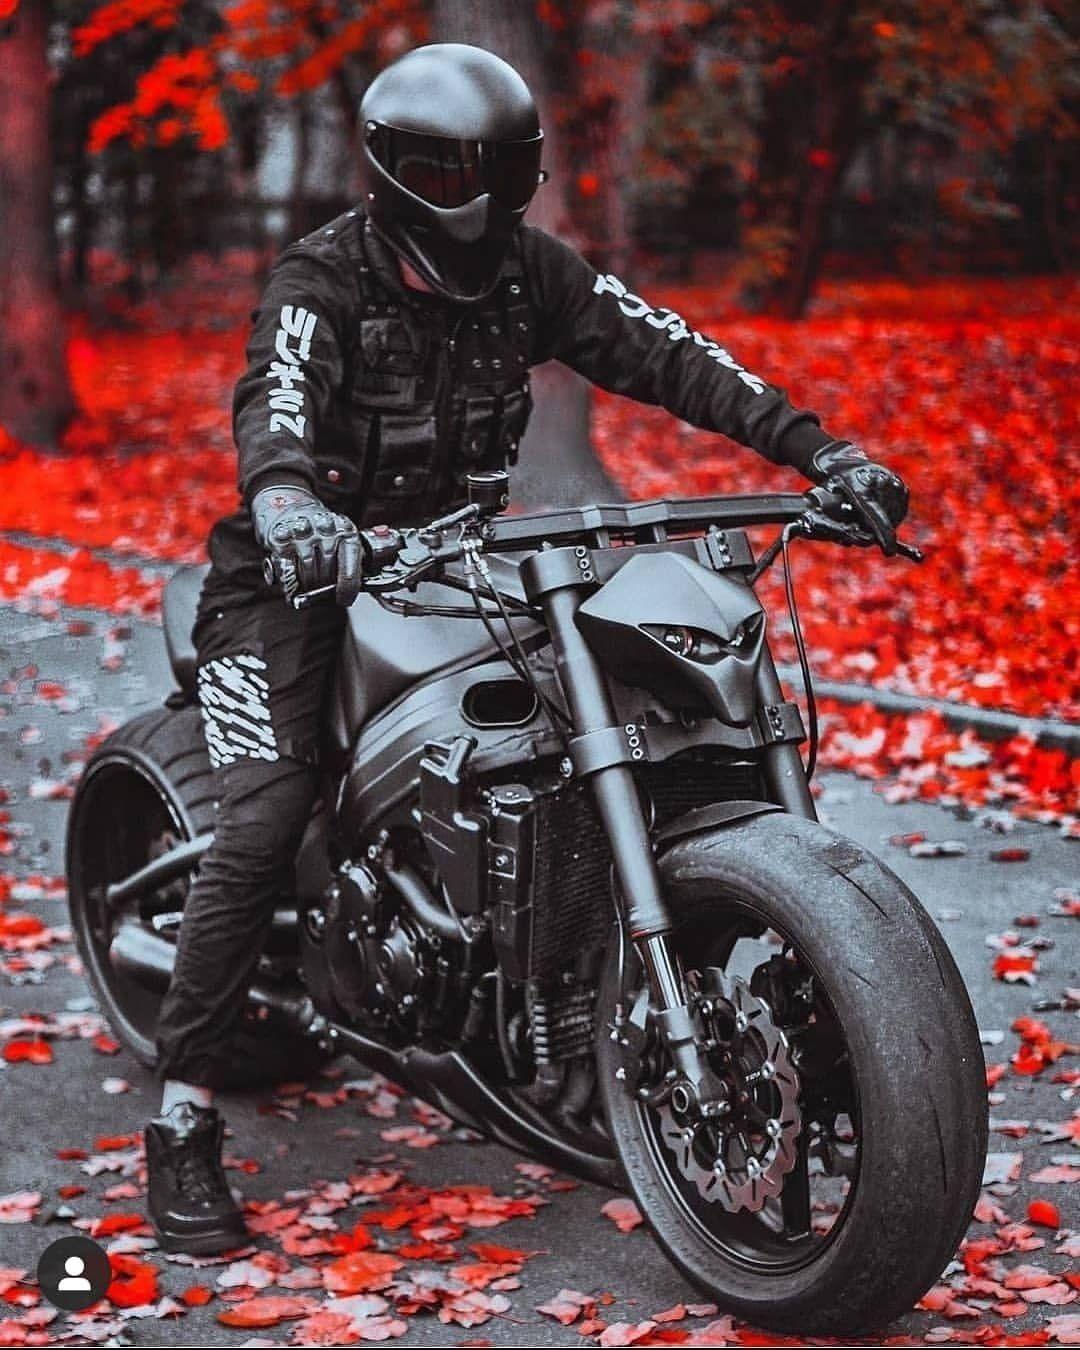 biker on